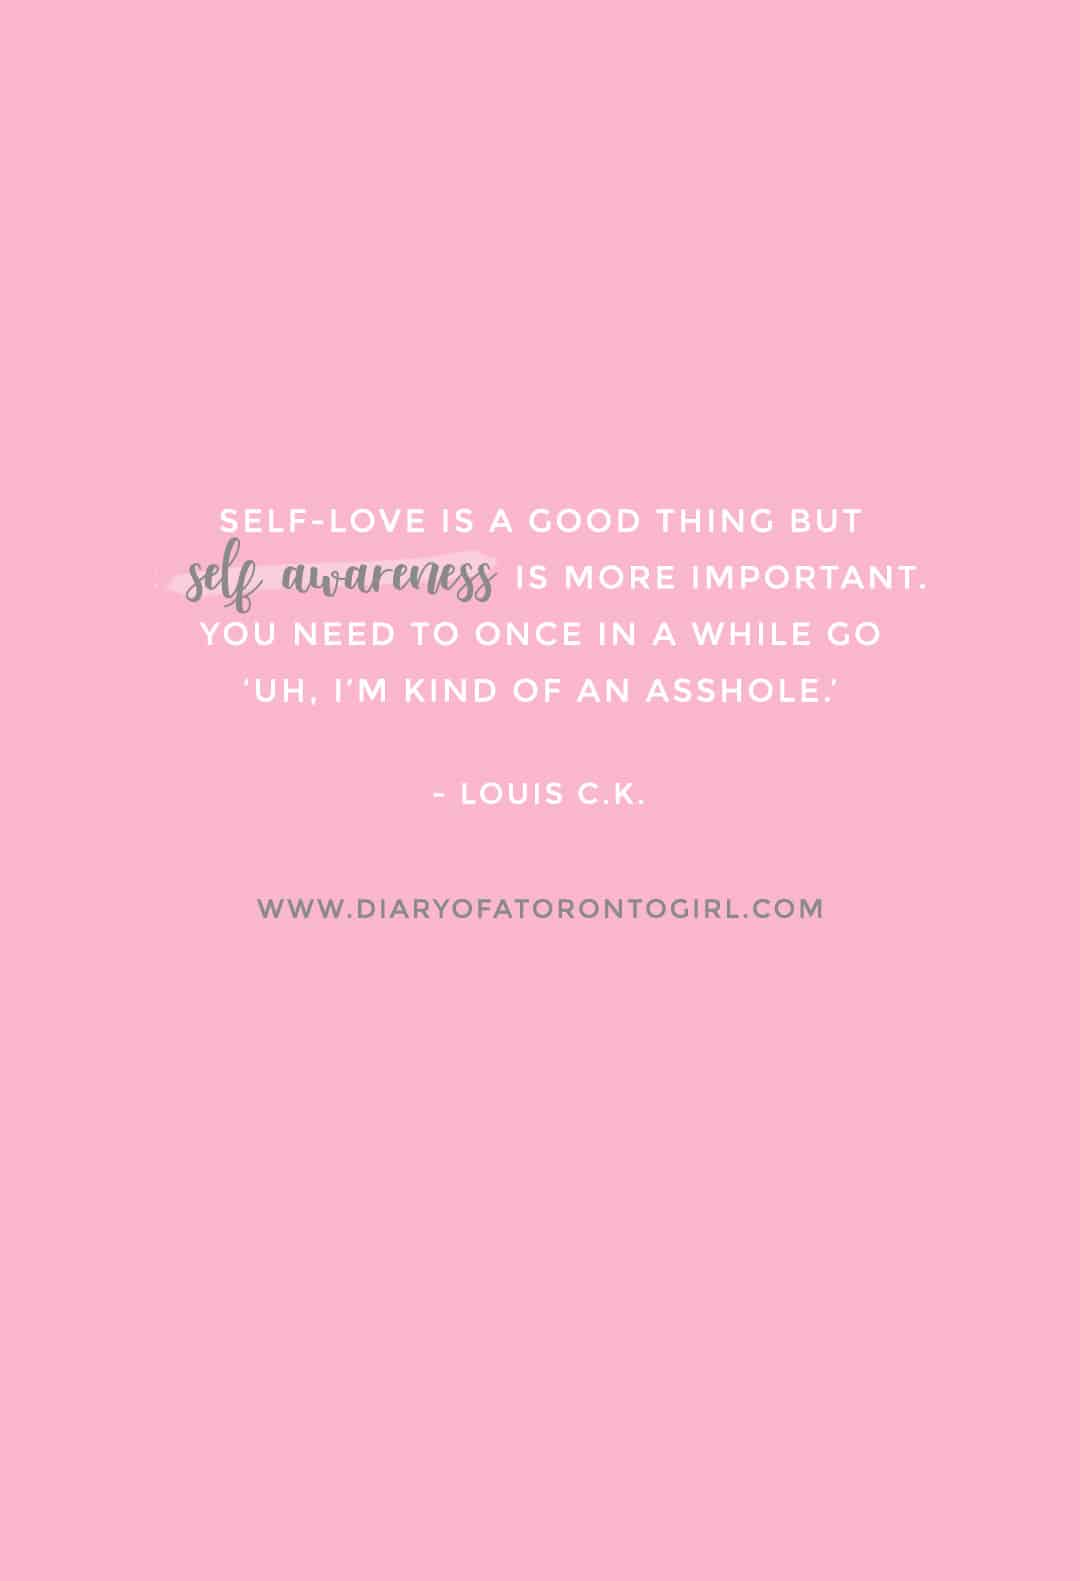 Louis C.K. inspirational quote